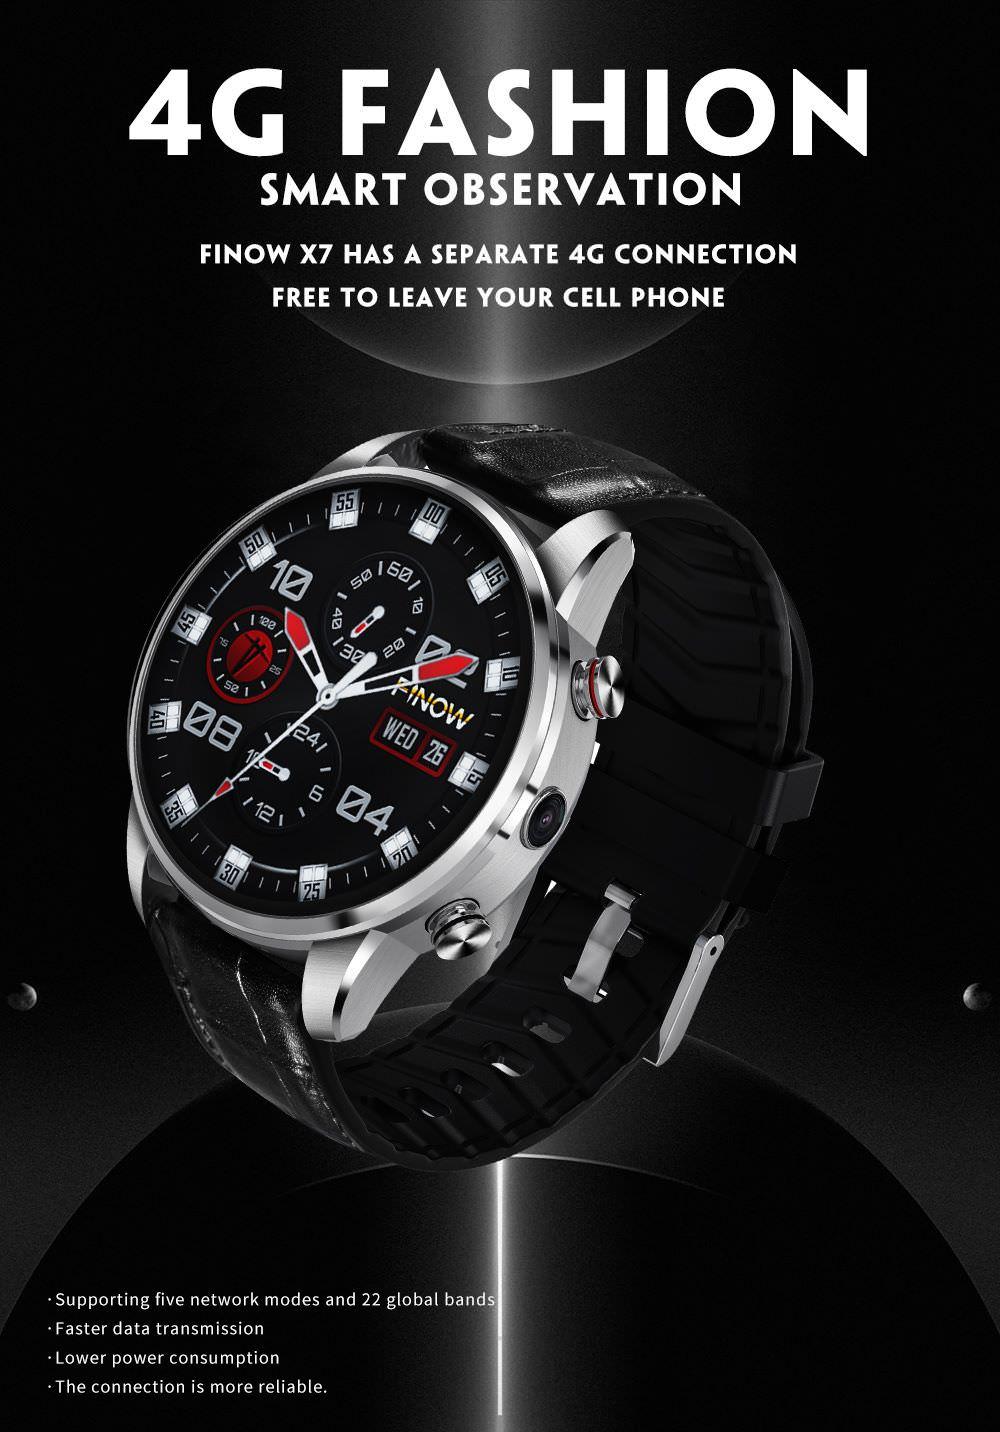 finow x7 4g smartwatch phone